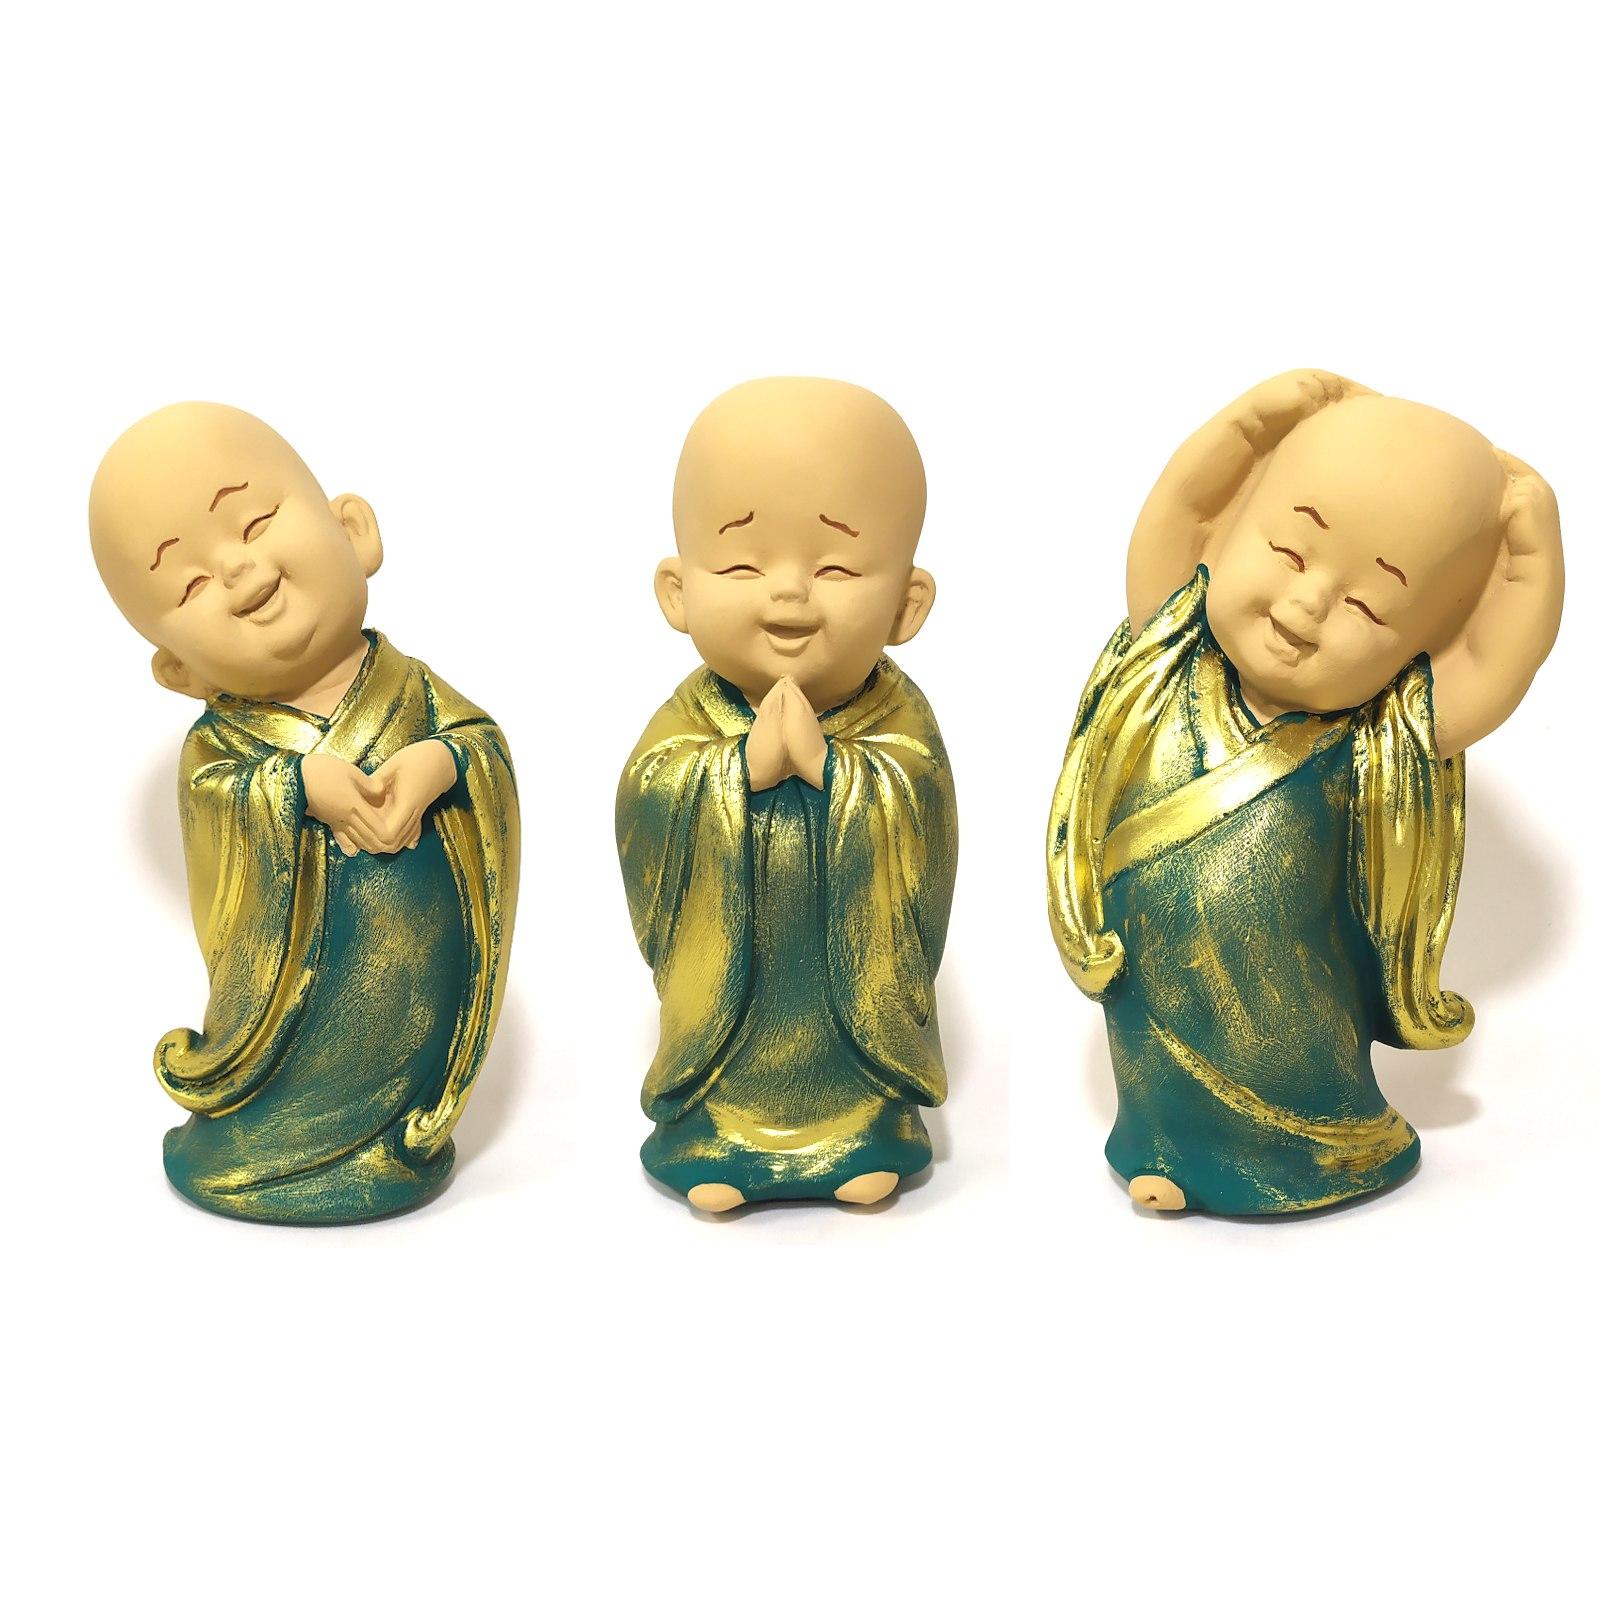 Trio de Monges da Harmonia (16cm)